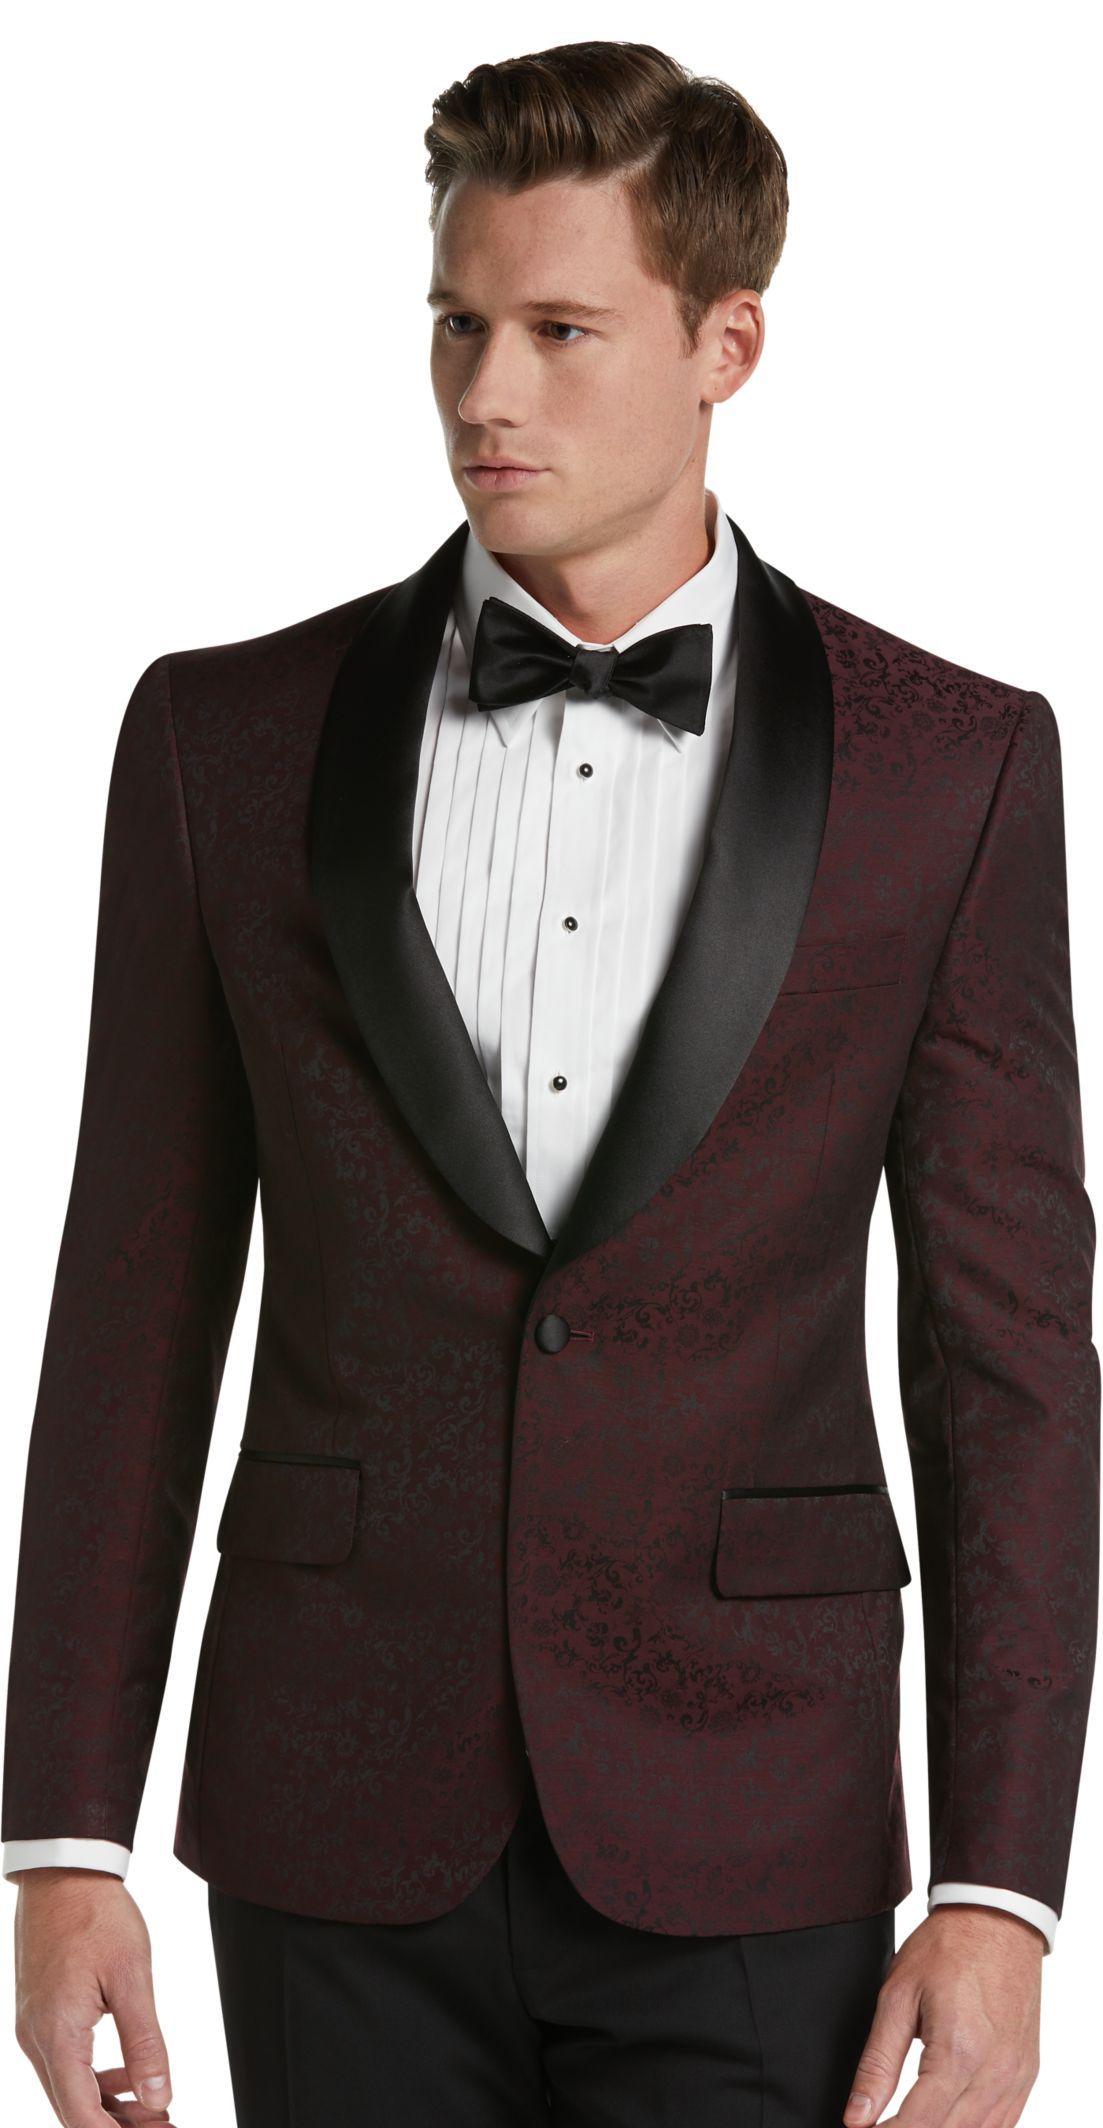 Jos. A. Bank Slim Fit Tonal Floral Pattern Dinner Jacket